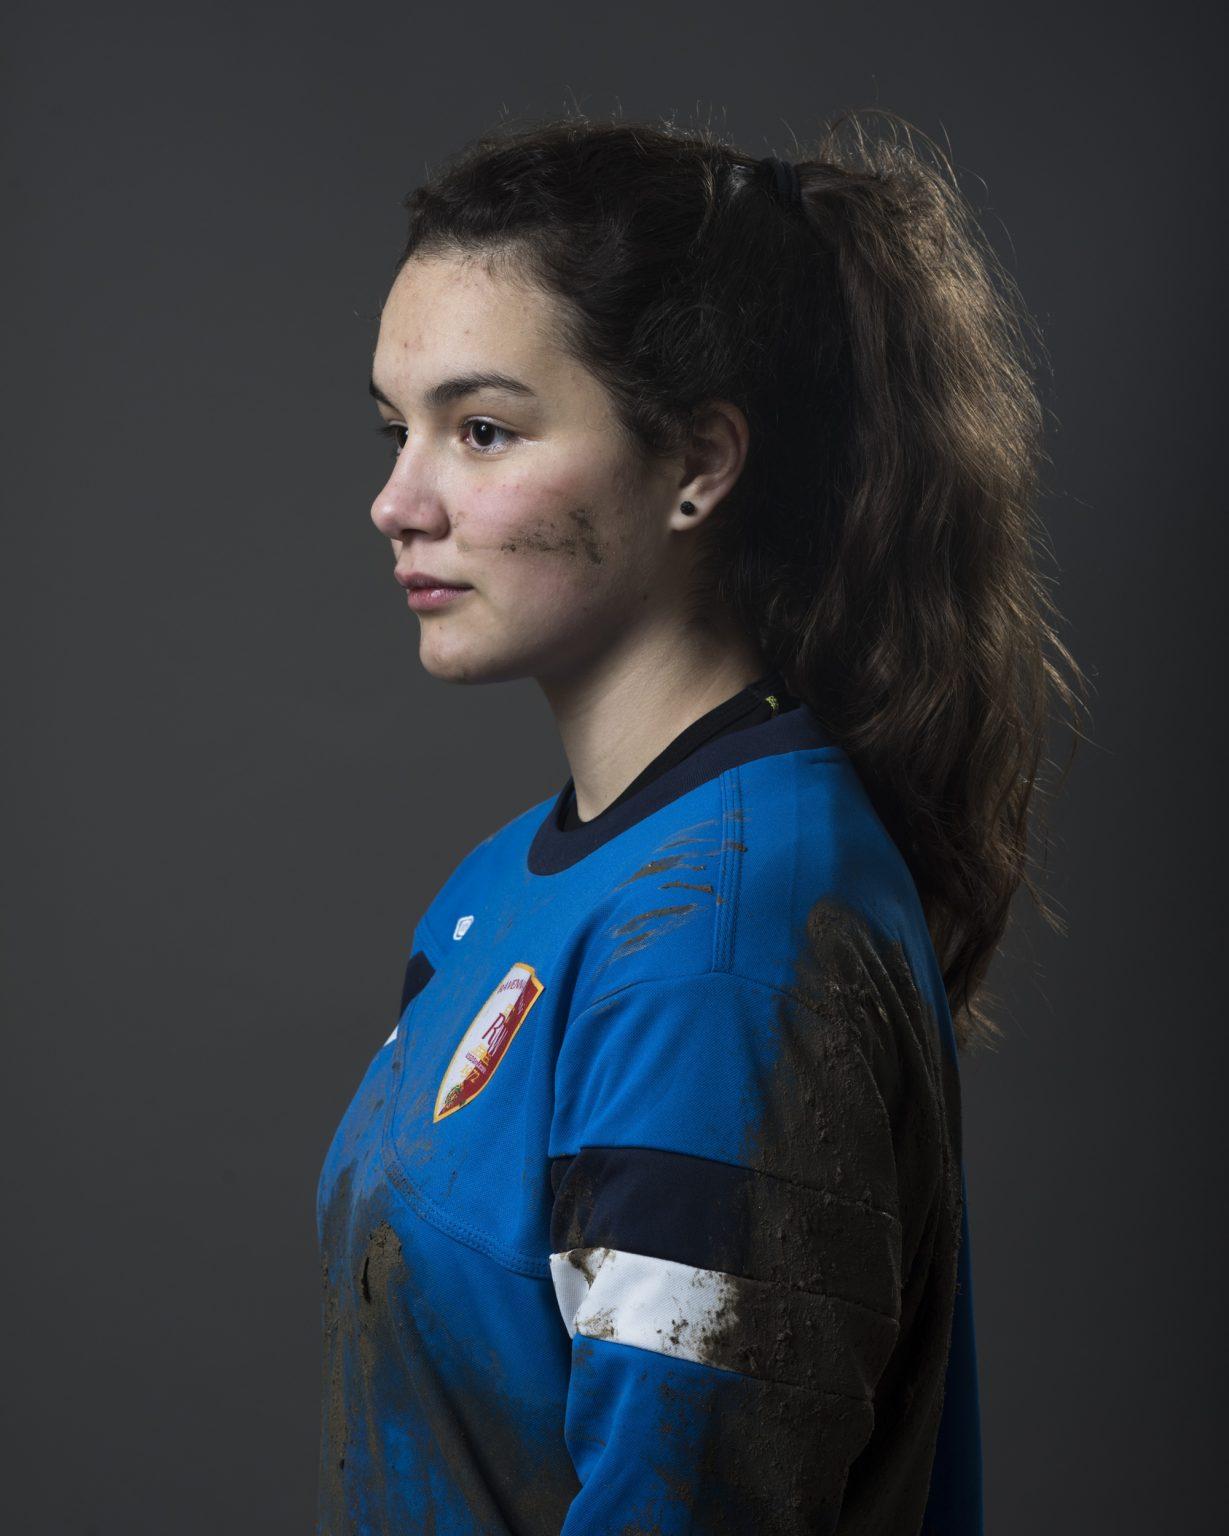 san-zaccaria-ra-calcio-femminile-ravenna-women-agnese-ballardini